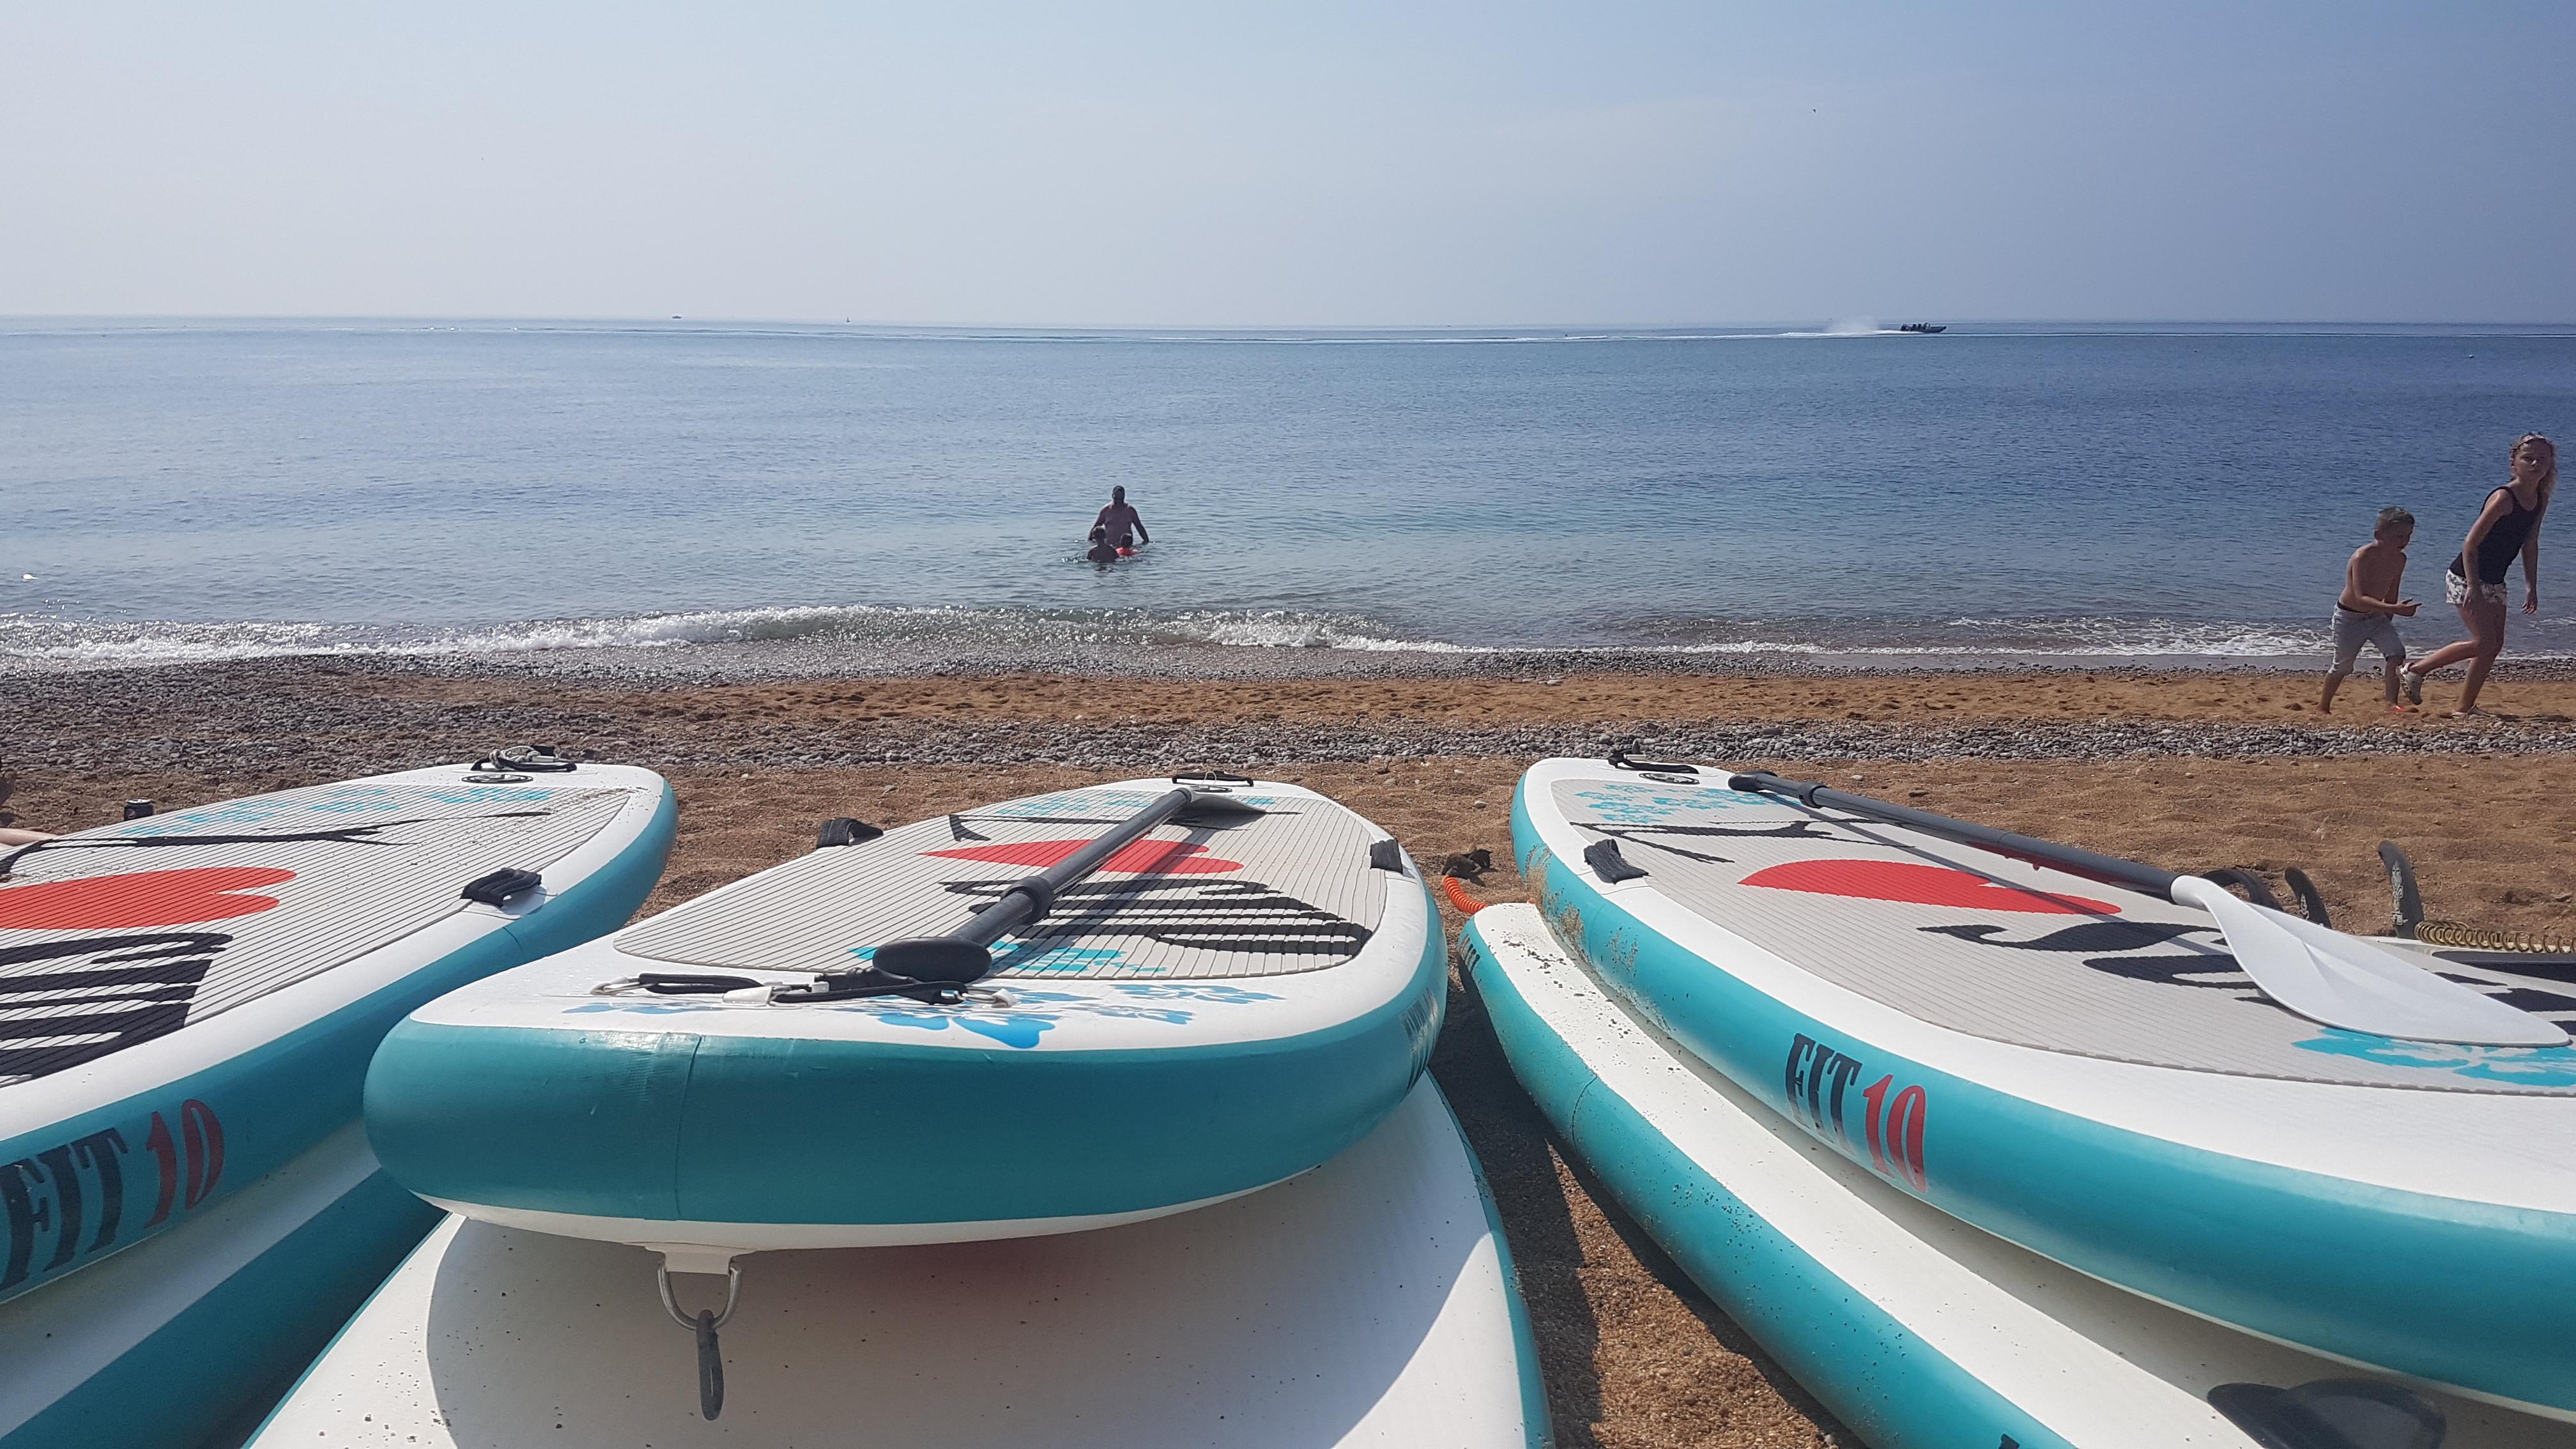 Paddle Board Beach Hire